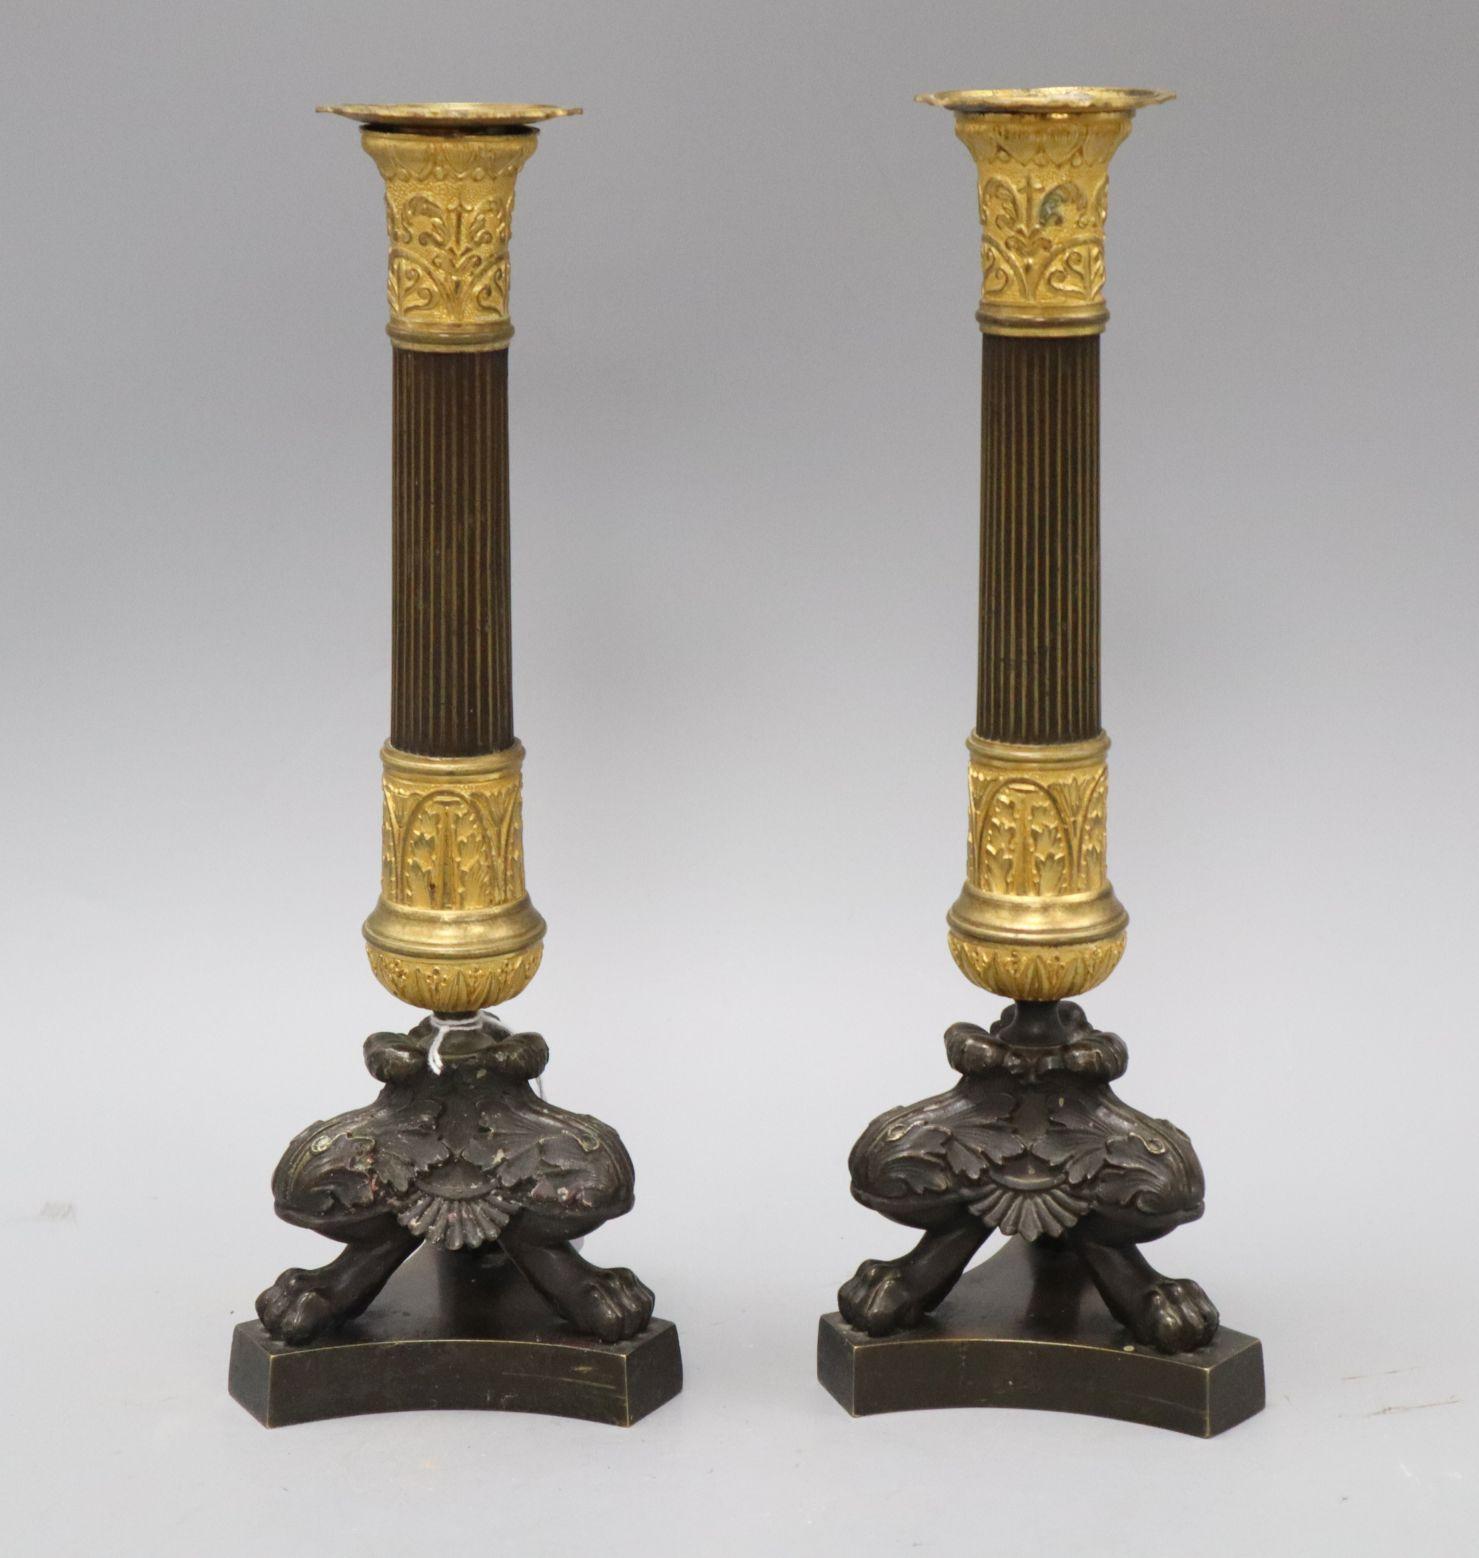 Lot 1098 - A pair of French Second Empire bronze and ormolu pillar candlesticks, H 29cm H.29.5cm